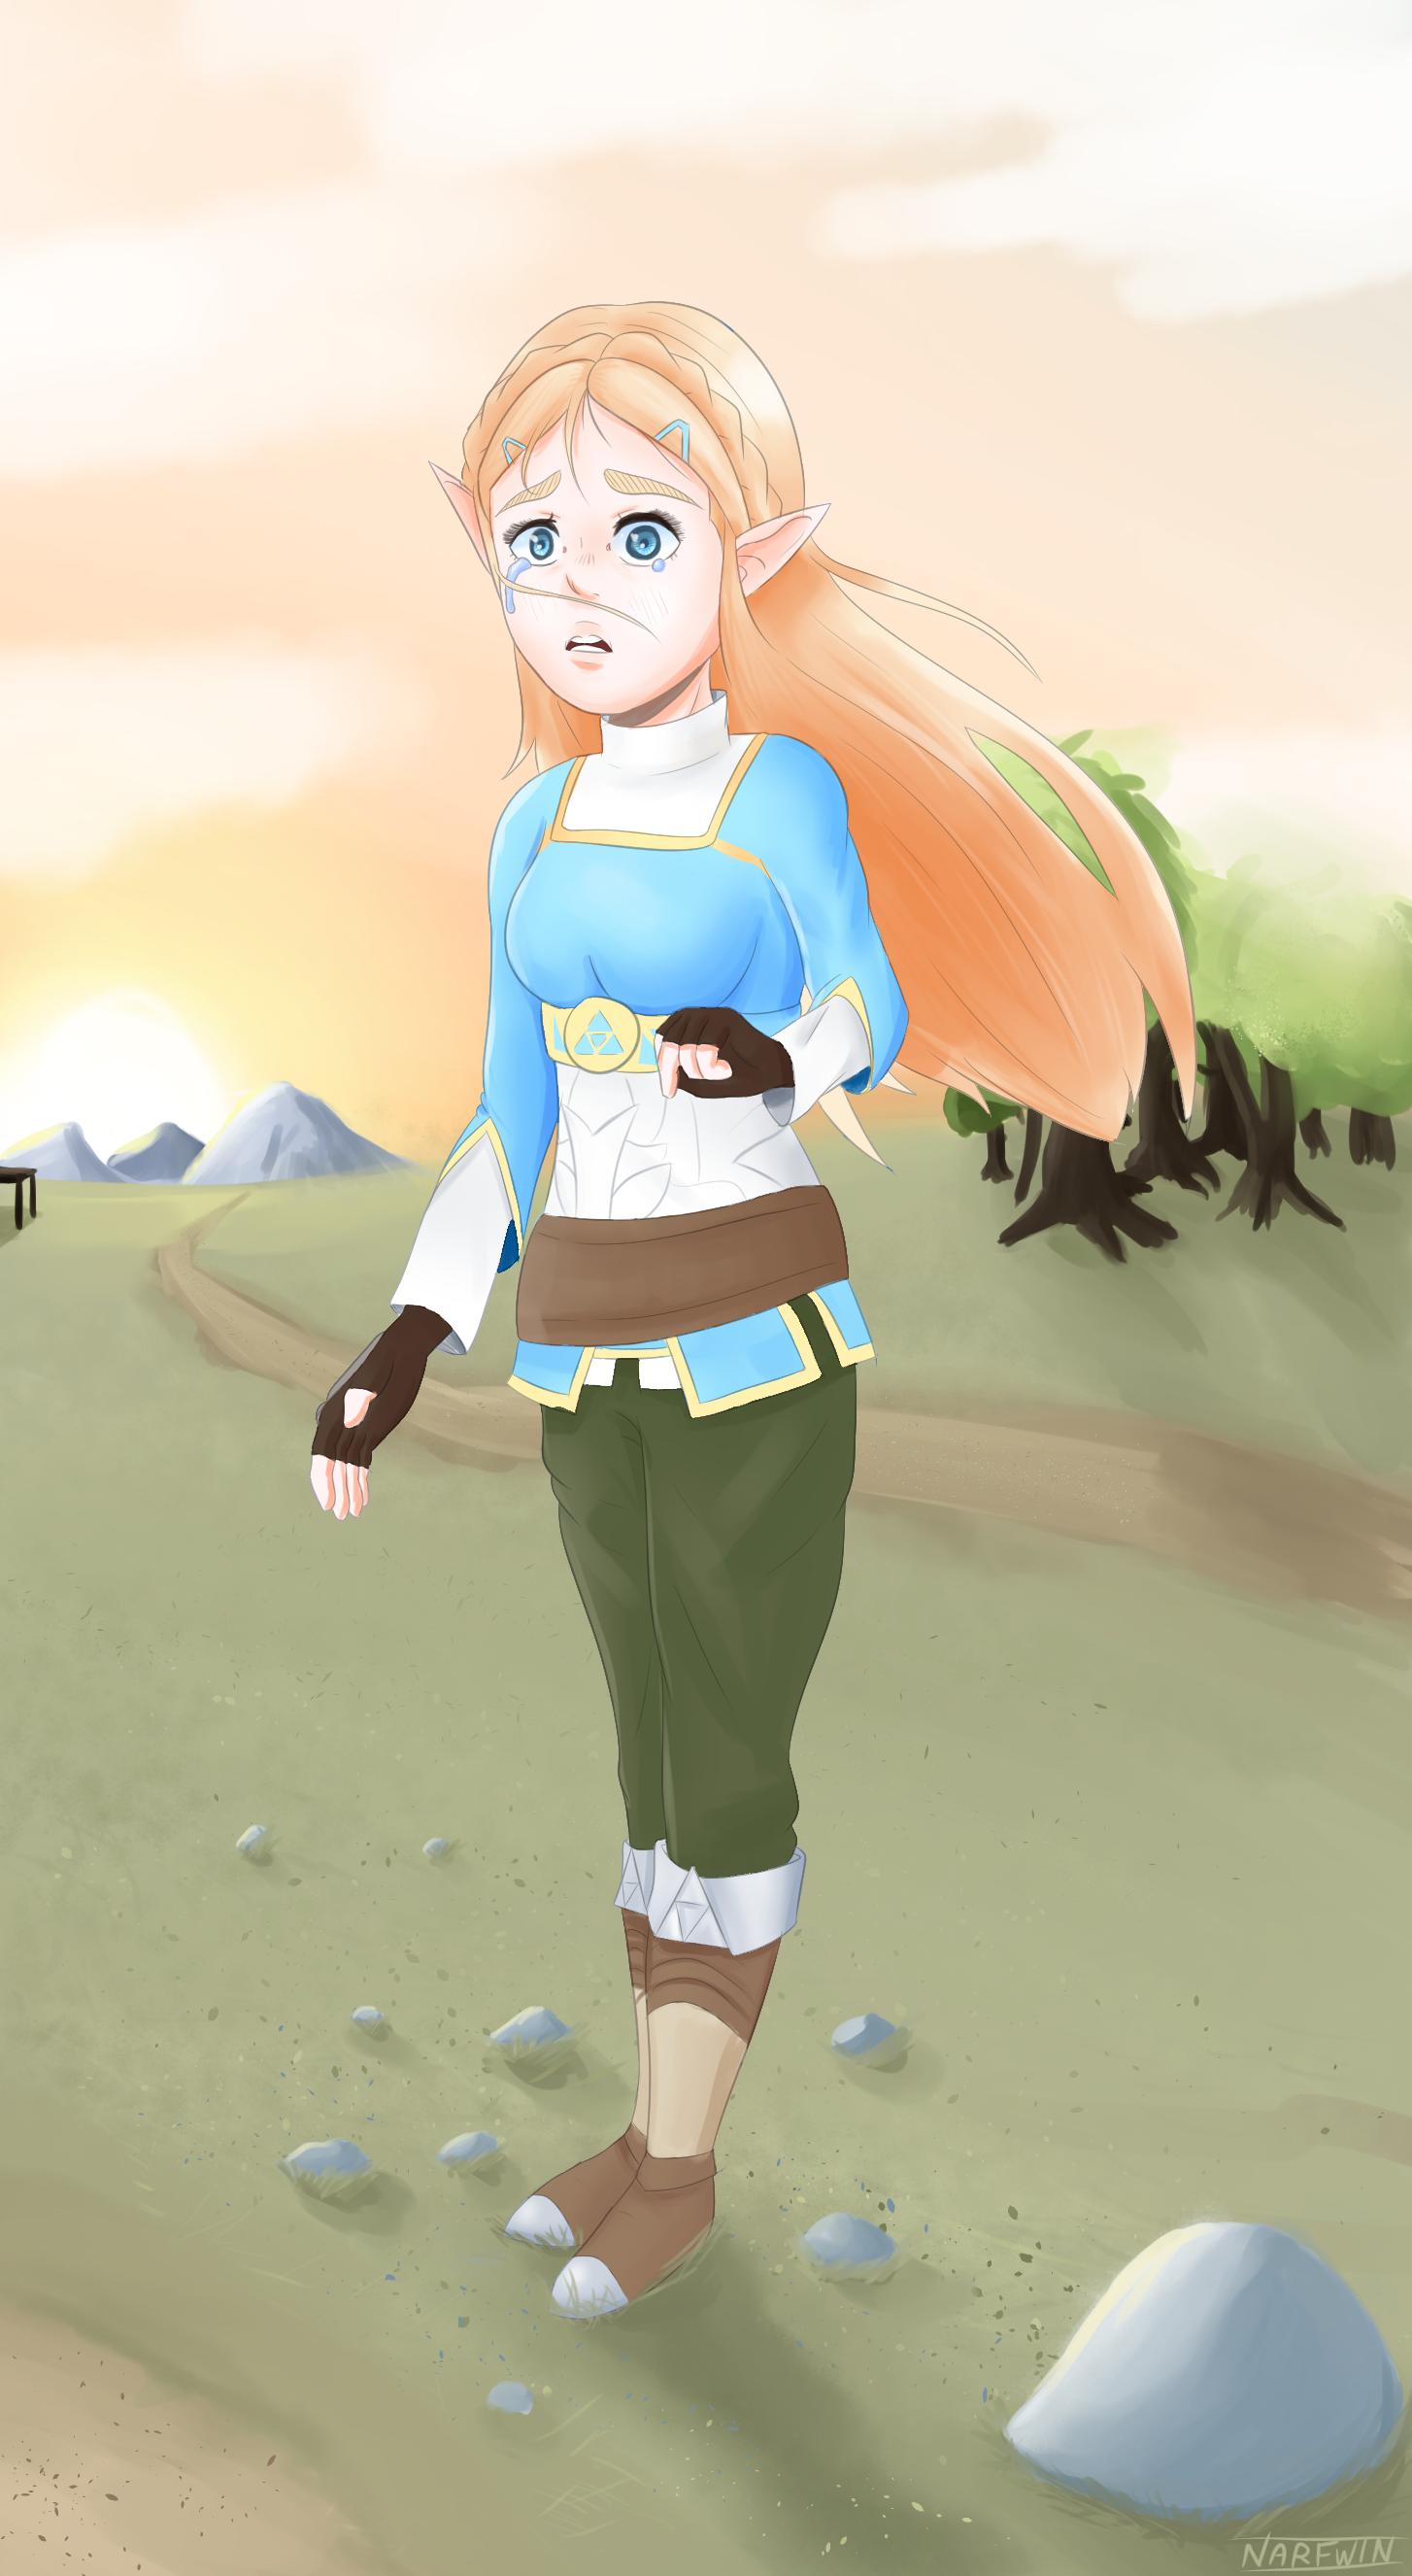 Zelda from Breath of the wild